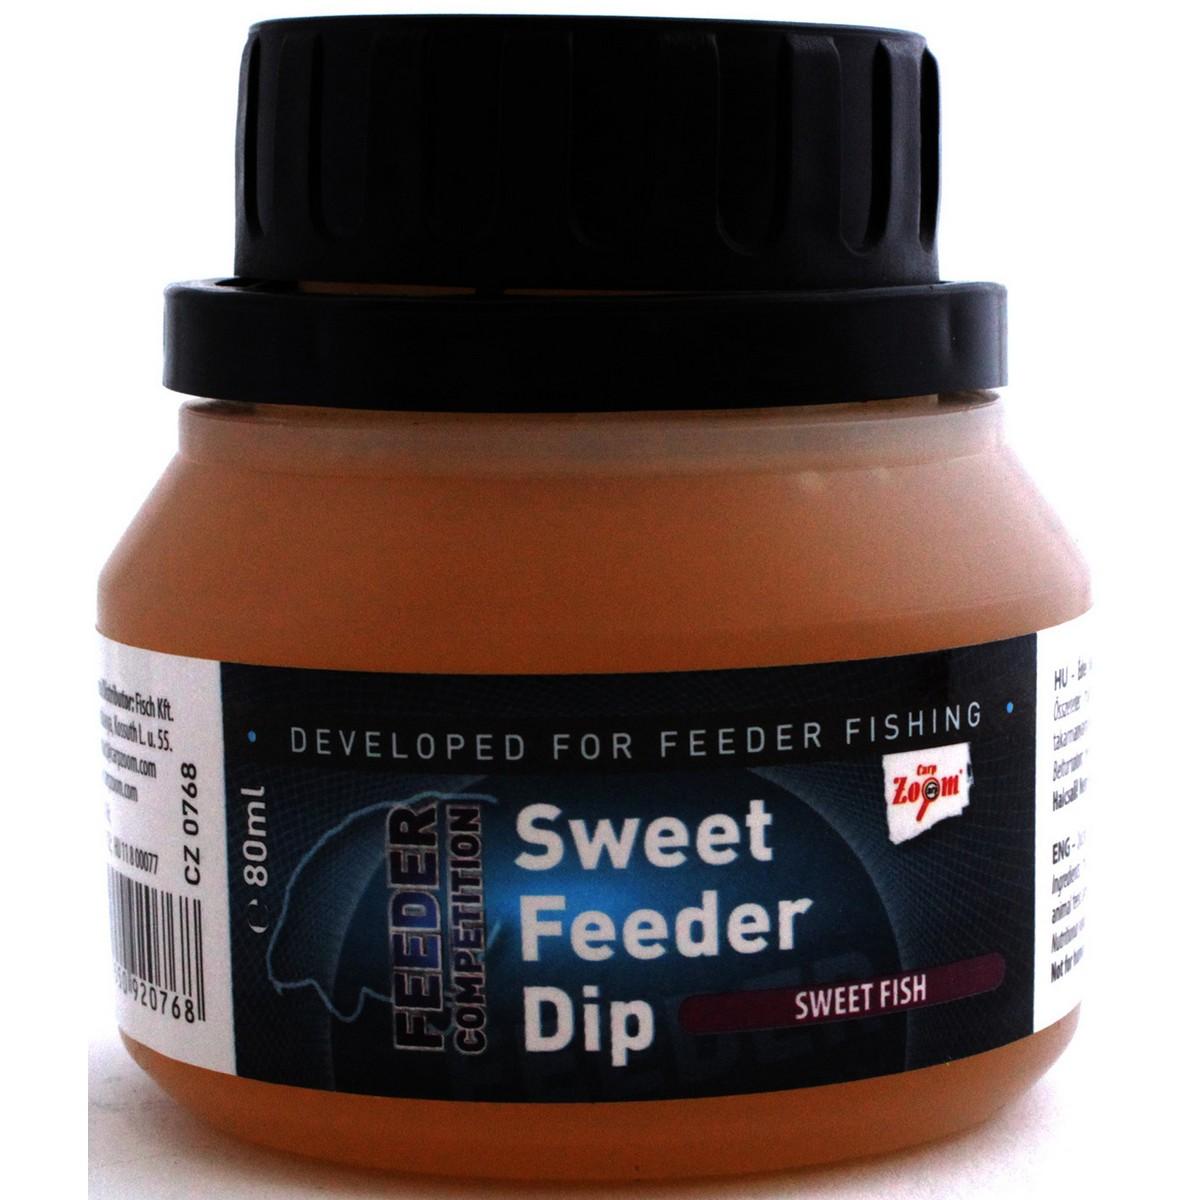 CZ FC Sweet Feeder Dip fish